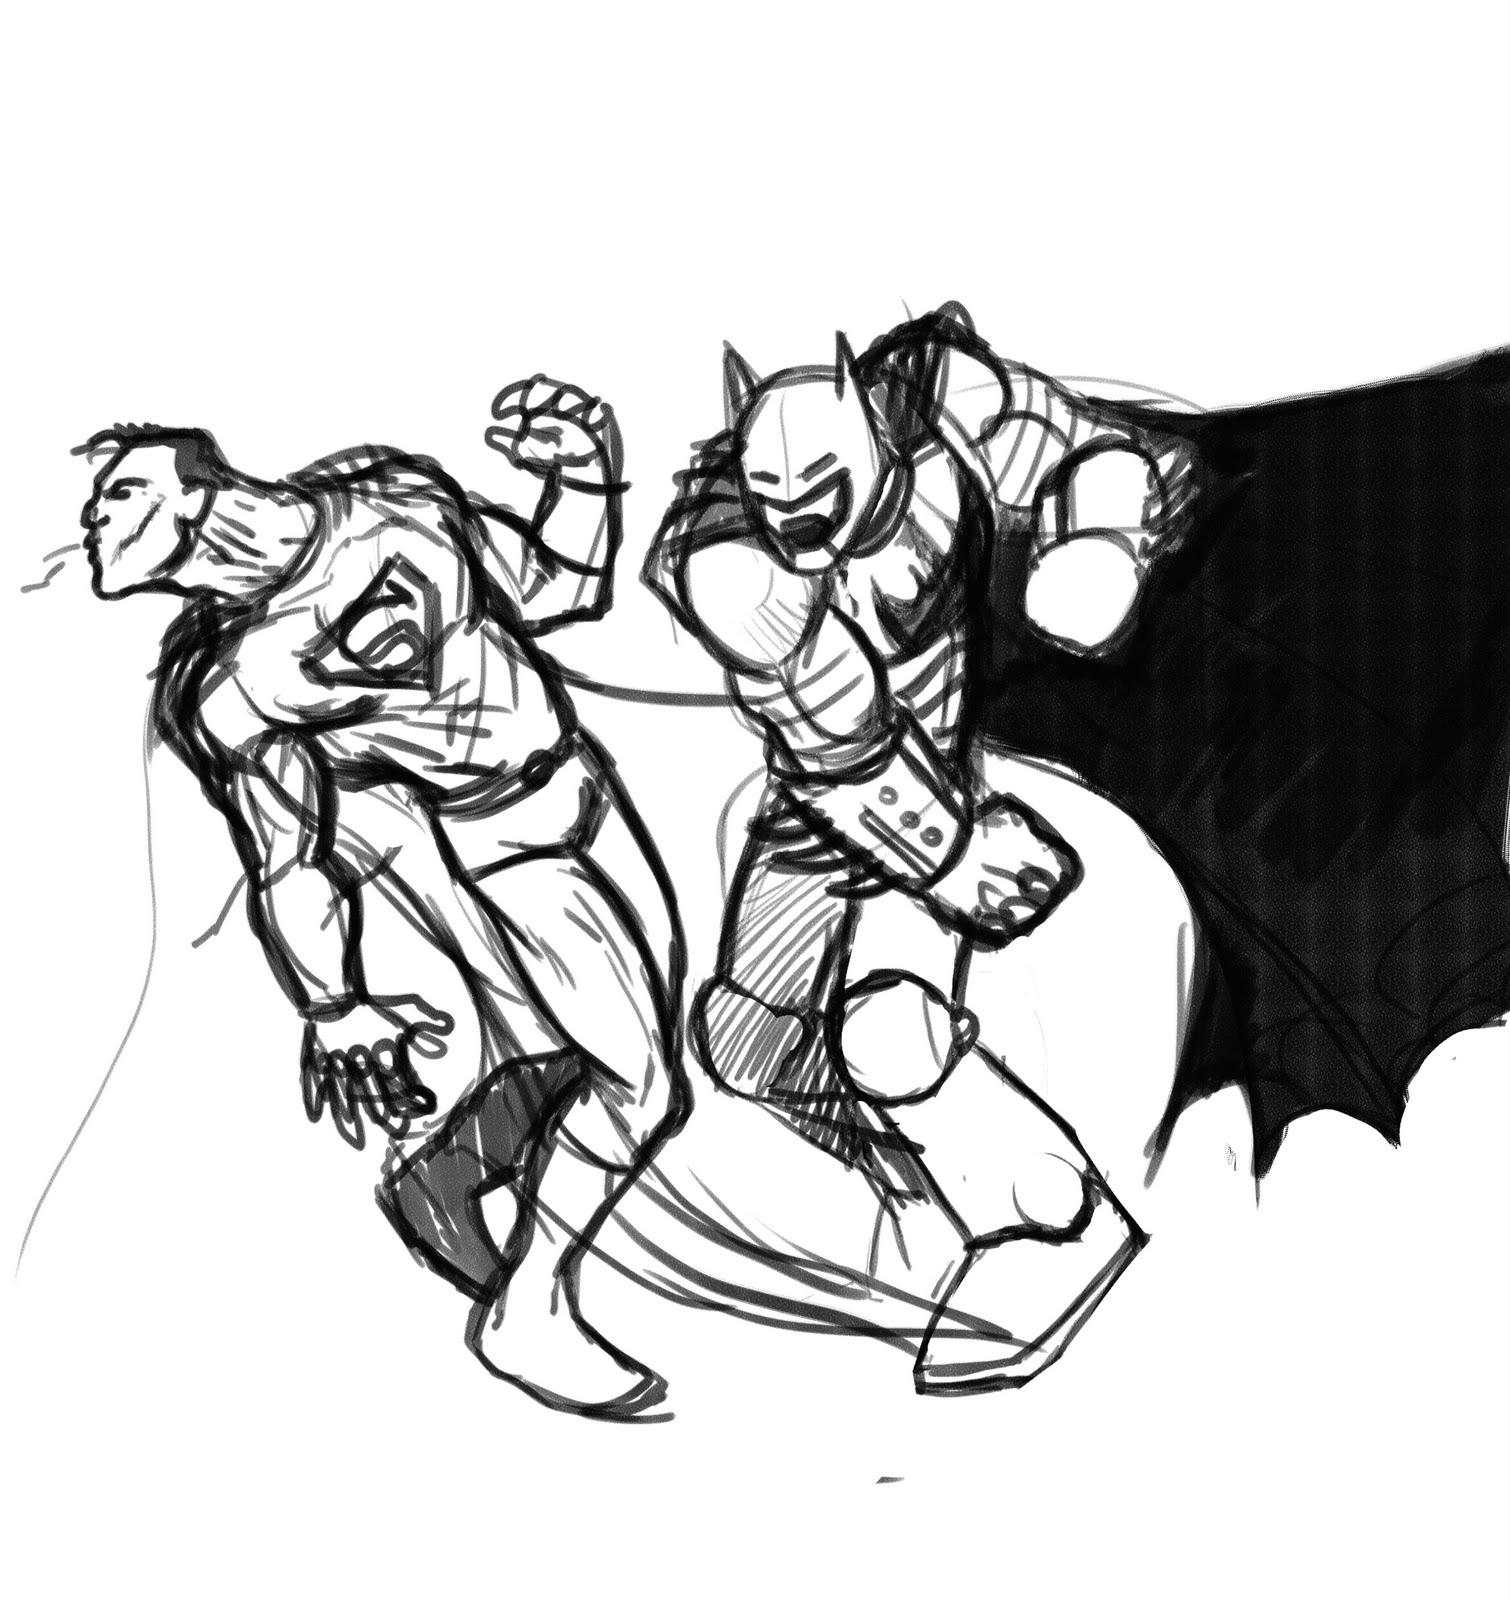 Moderno Dc Comics Batman Para Colorear Imagen - Dibujos Para ...